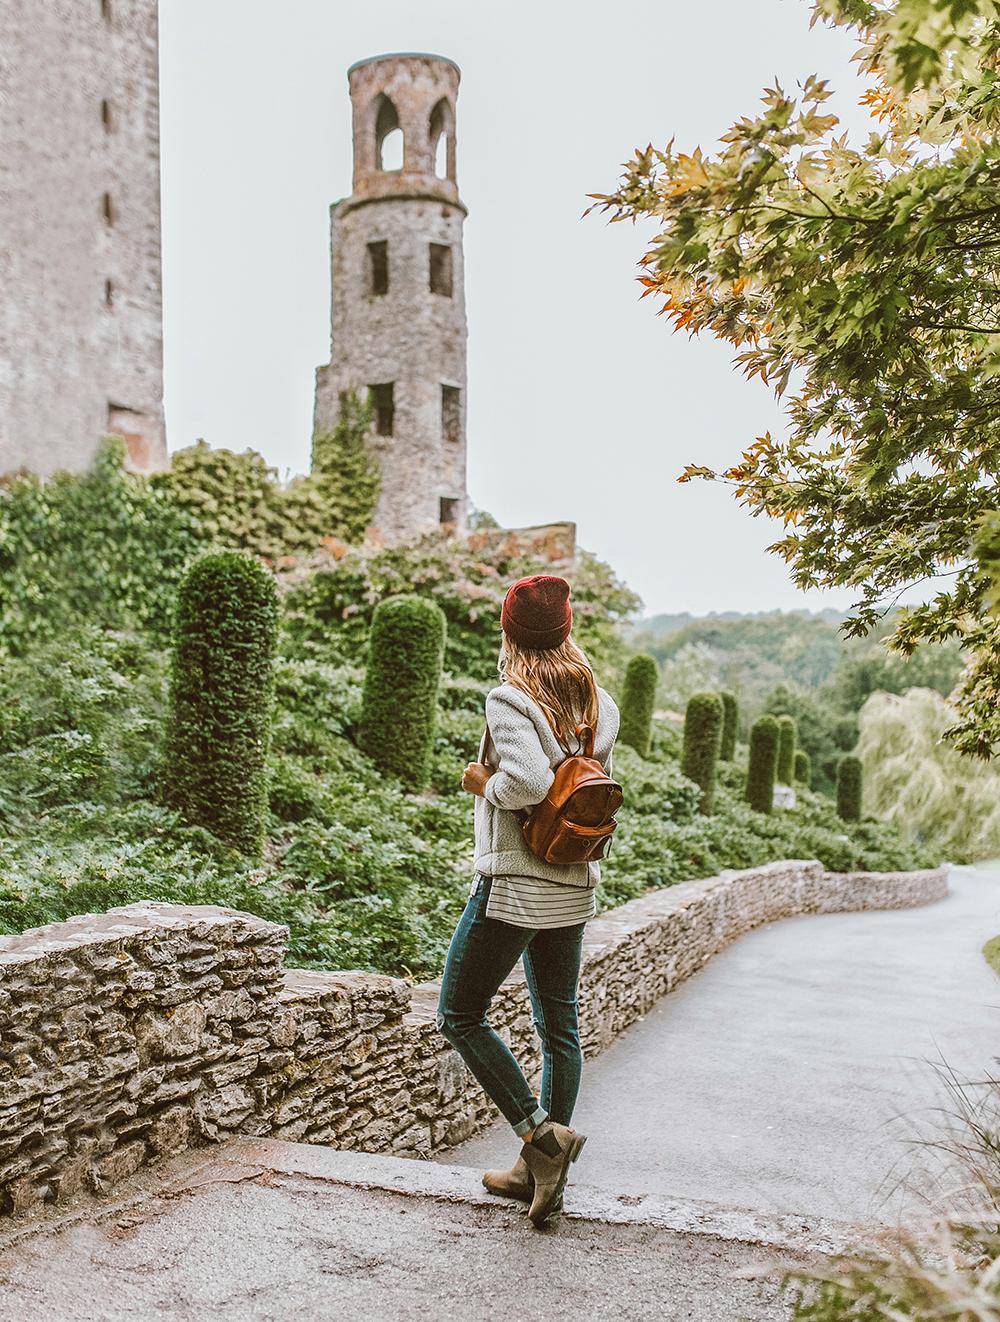 livvyland-blog-olivia-watson-princess-cruise-british-isles-cork-ireland-blarney-castle-what-to-wear-pack-itinerary-1